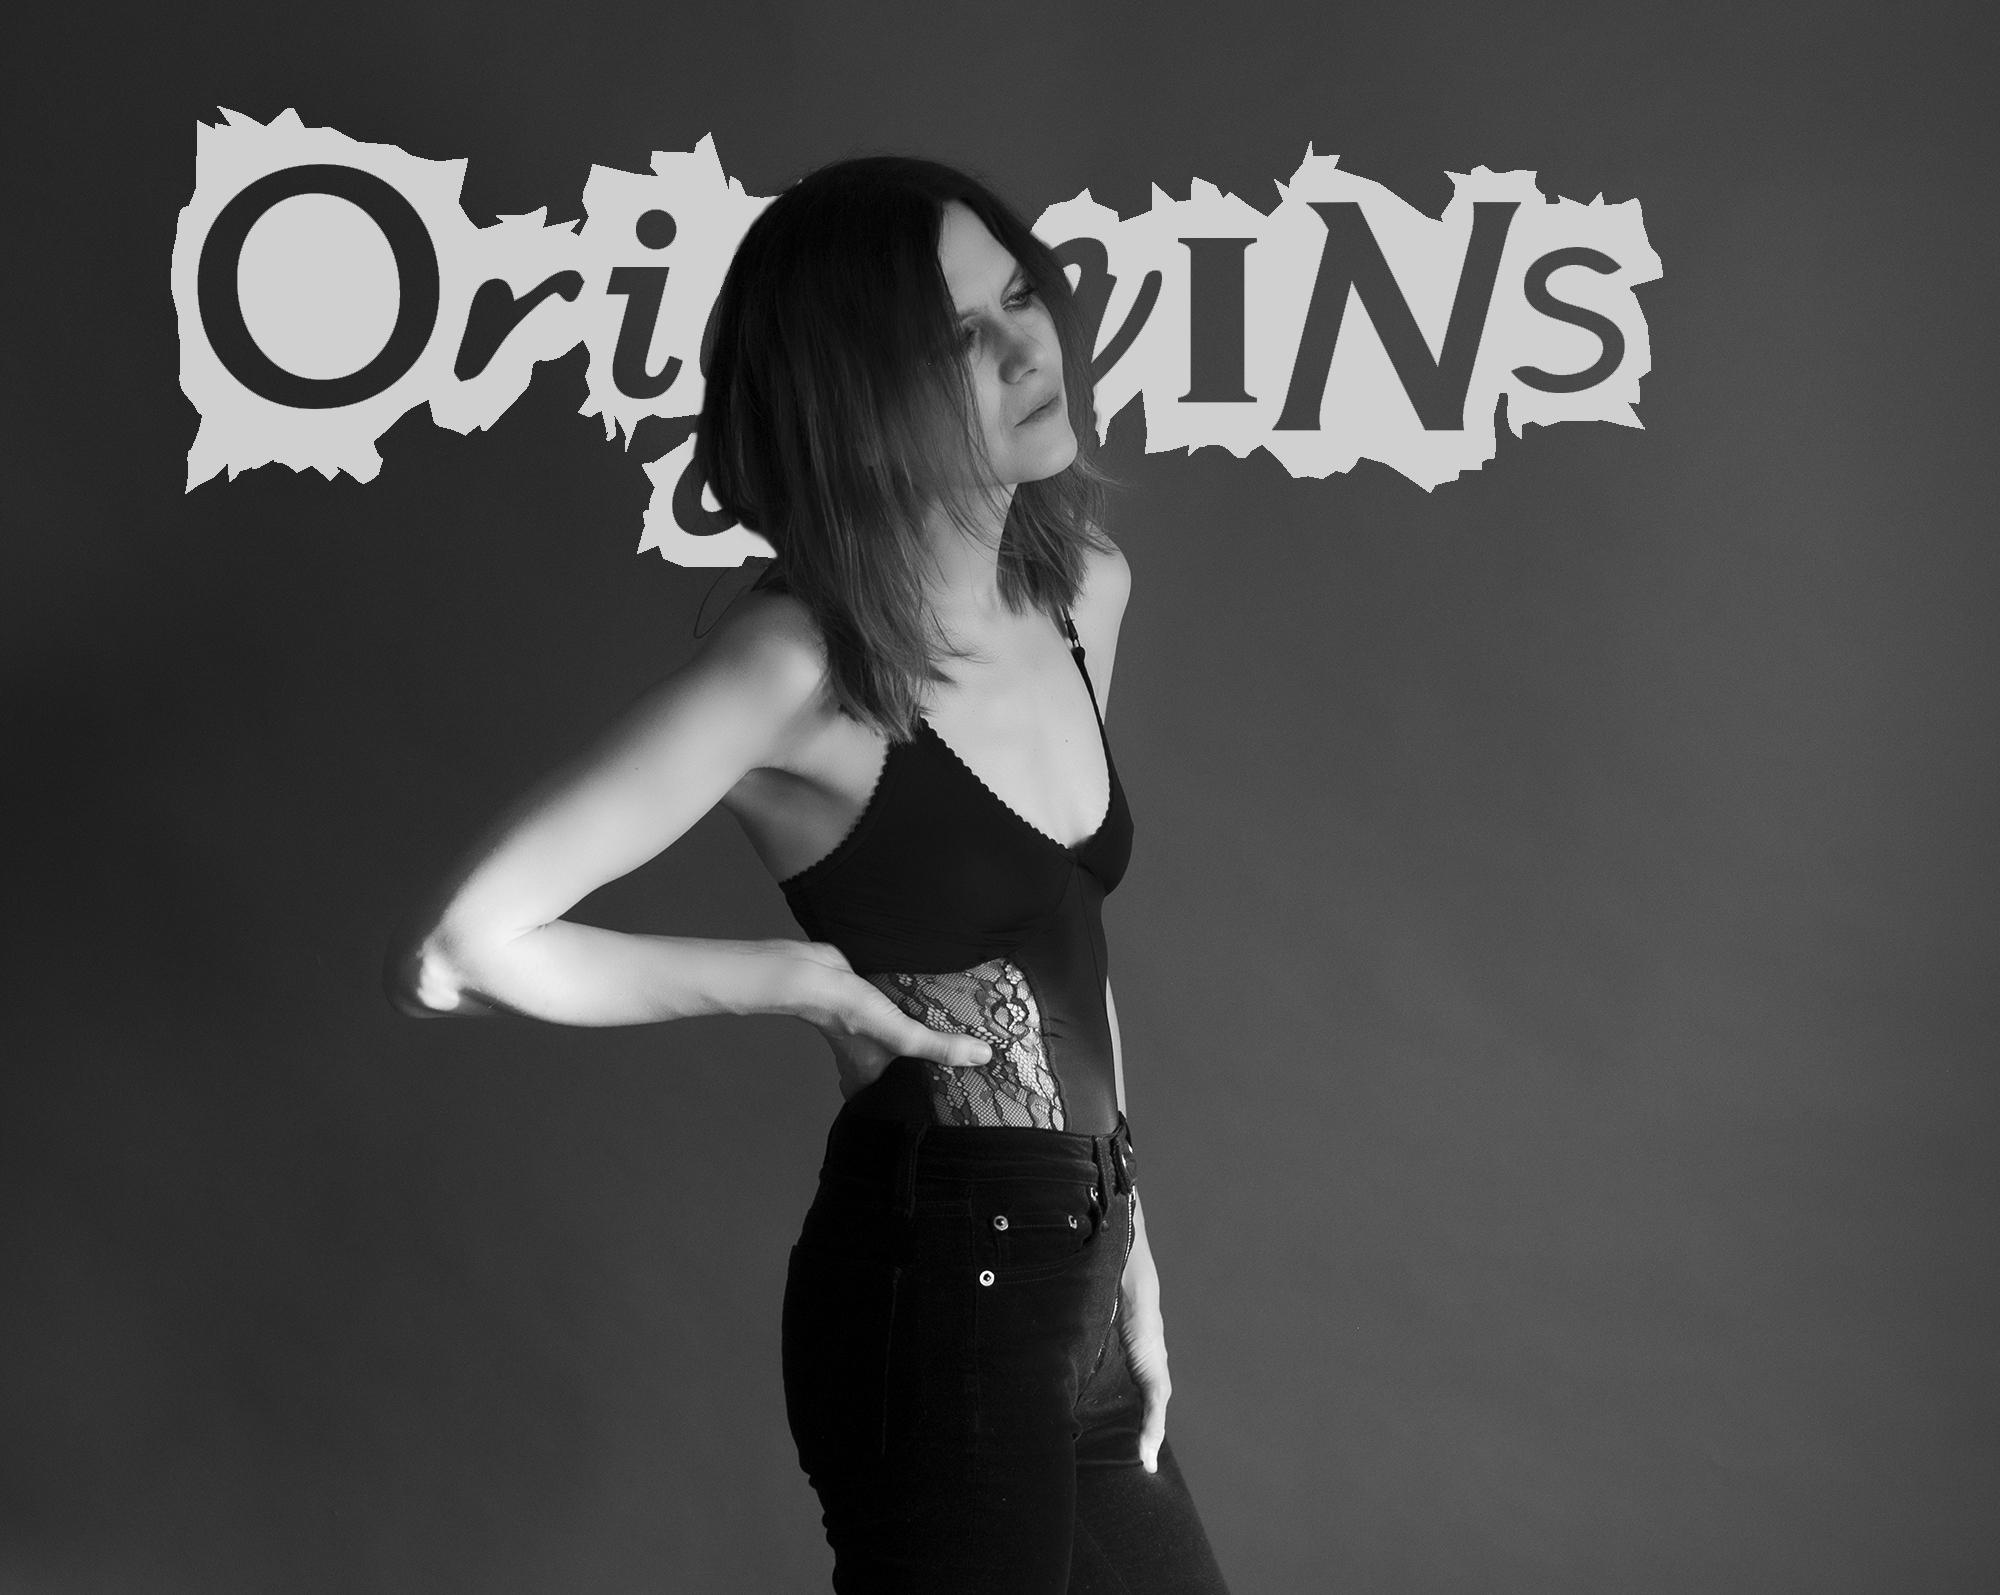 juliana hatfield photo by david doobinin all right yeah origins music video